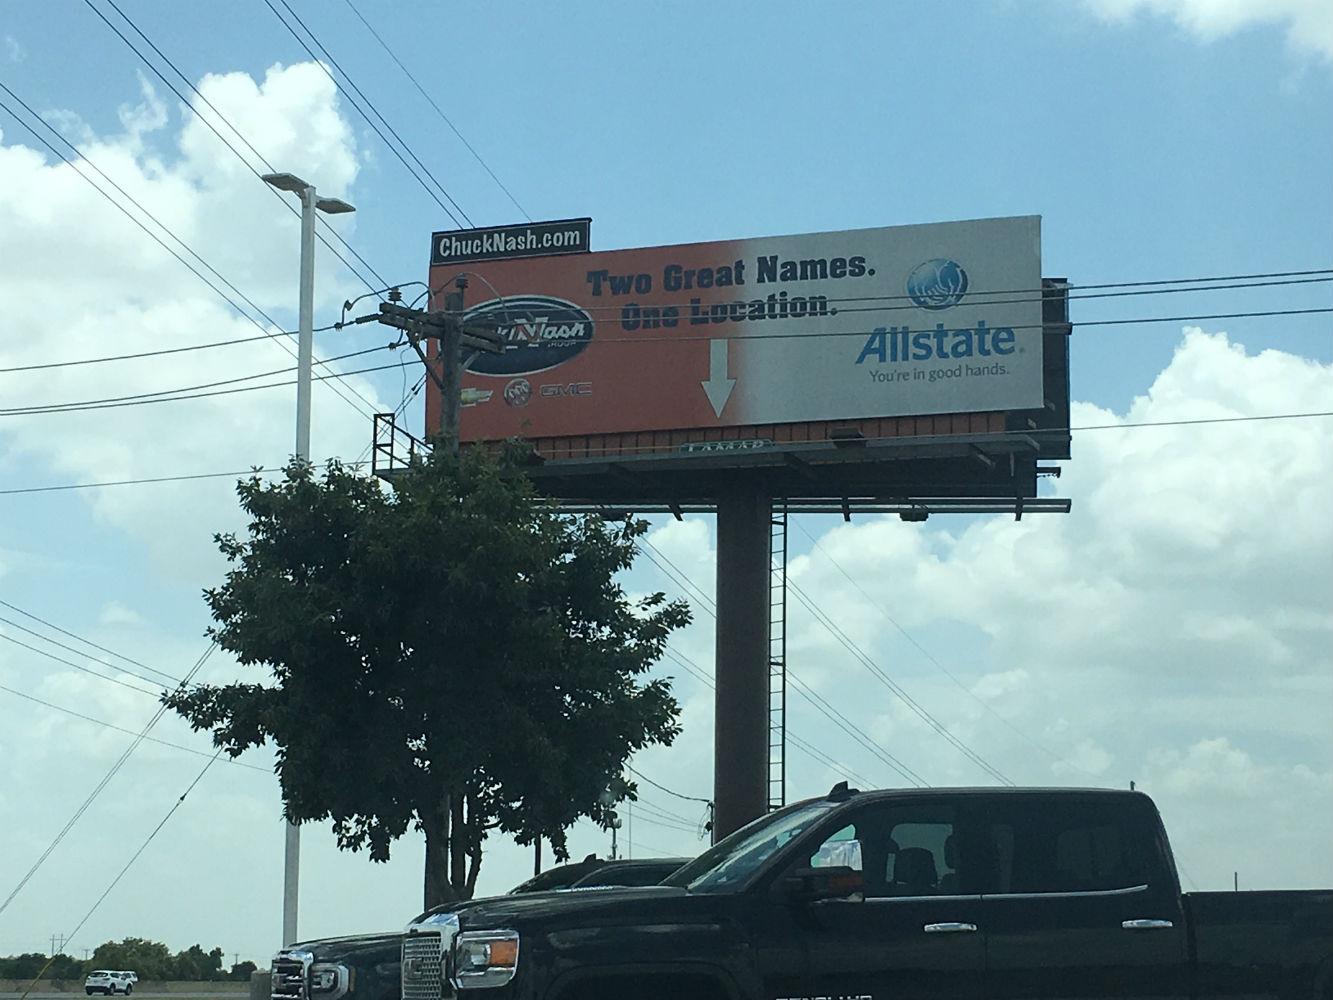 Robert Ruiz: Allstate Insurance image 1